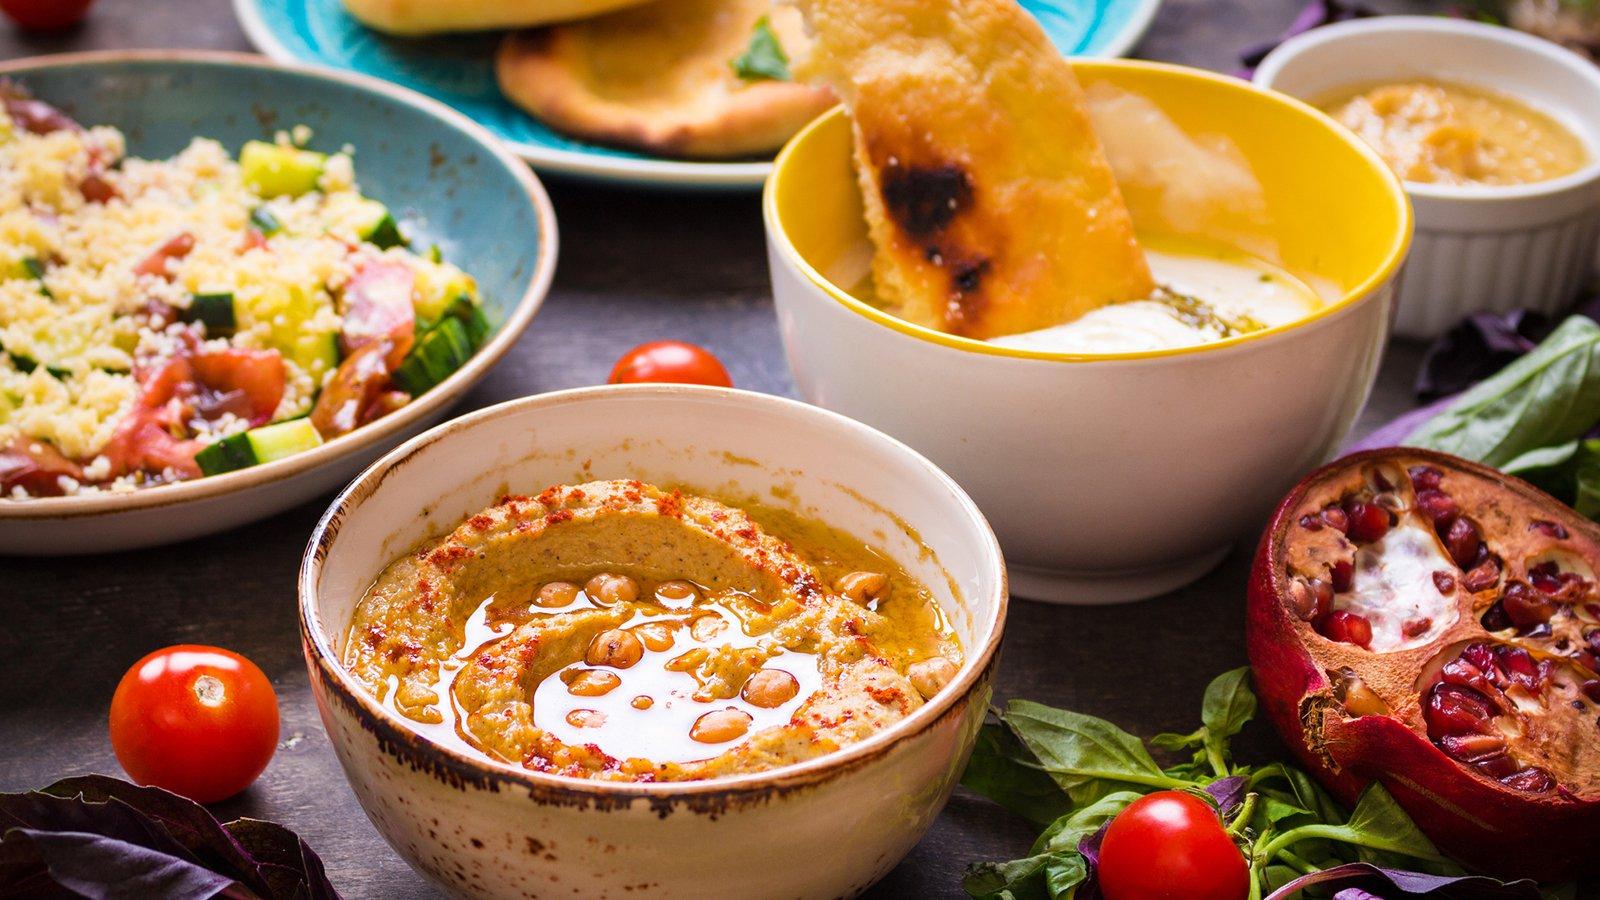 Levante Küche: Der neue Food-Trend kommt aus Nahost  GuteKueche.de